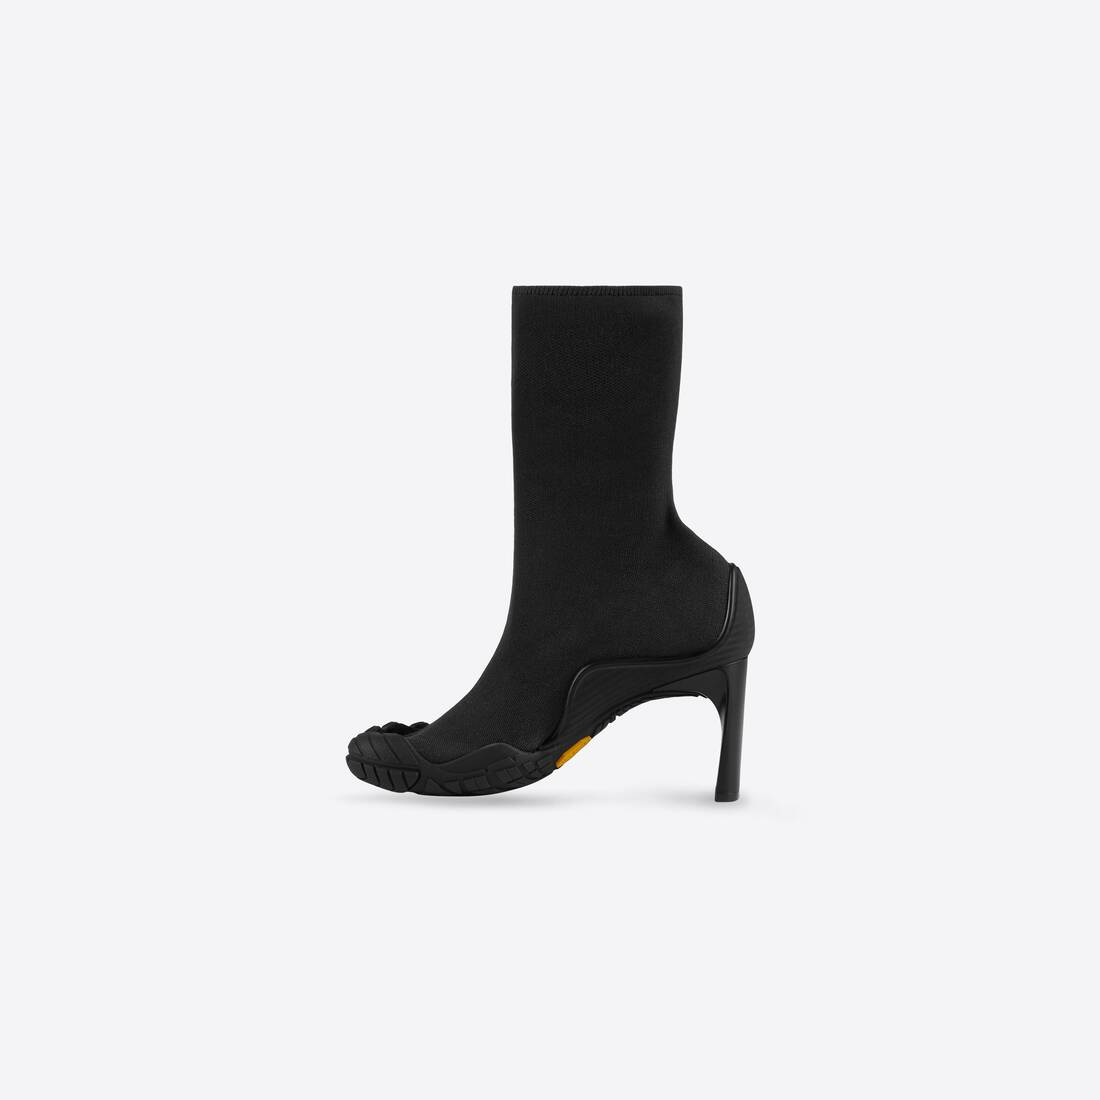 Display zoomed version of heeled toe  4